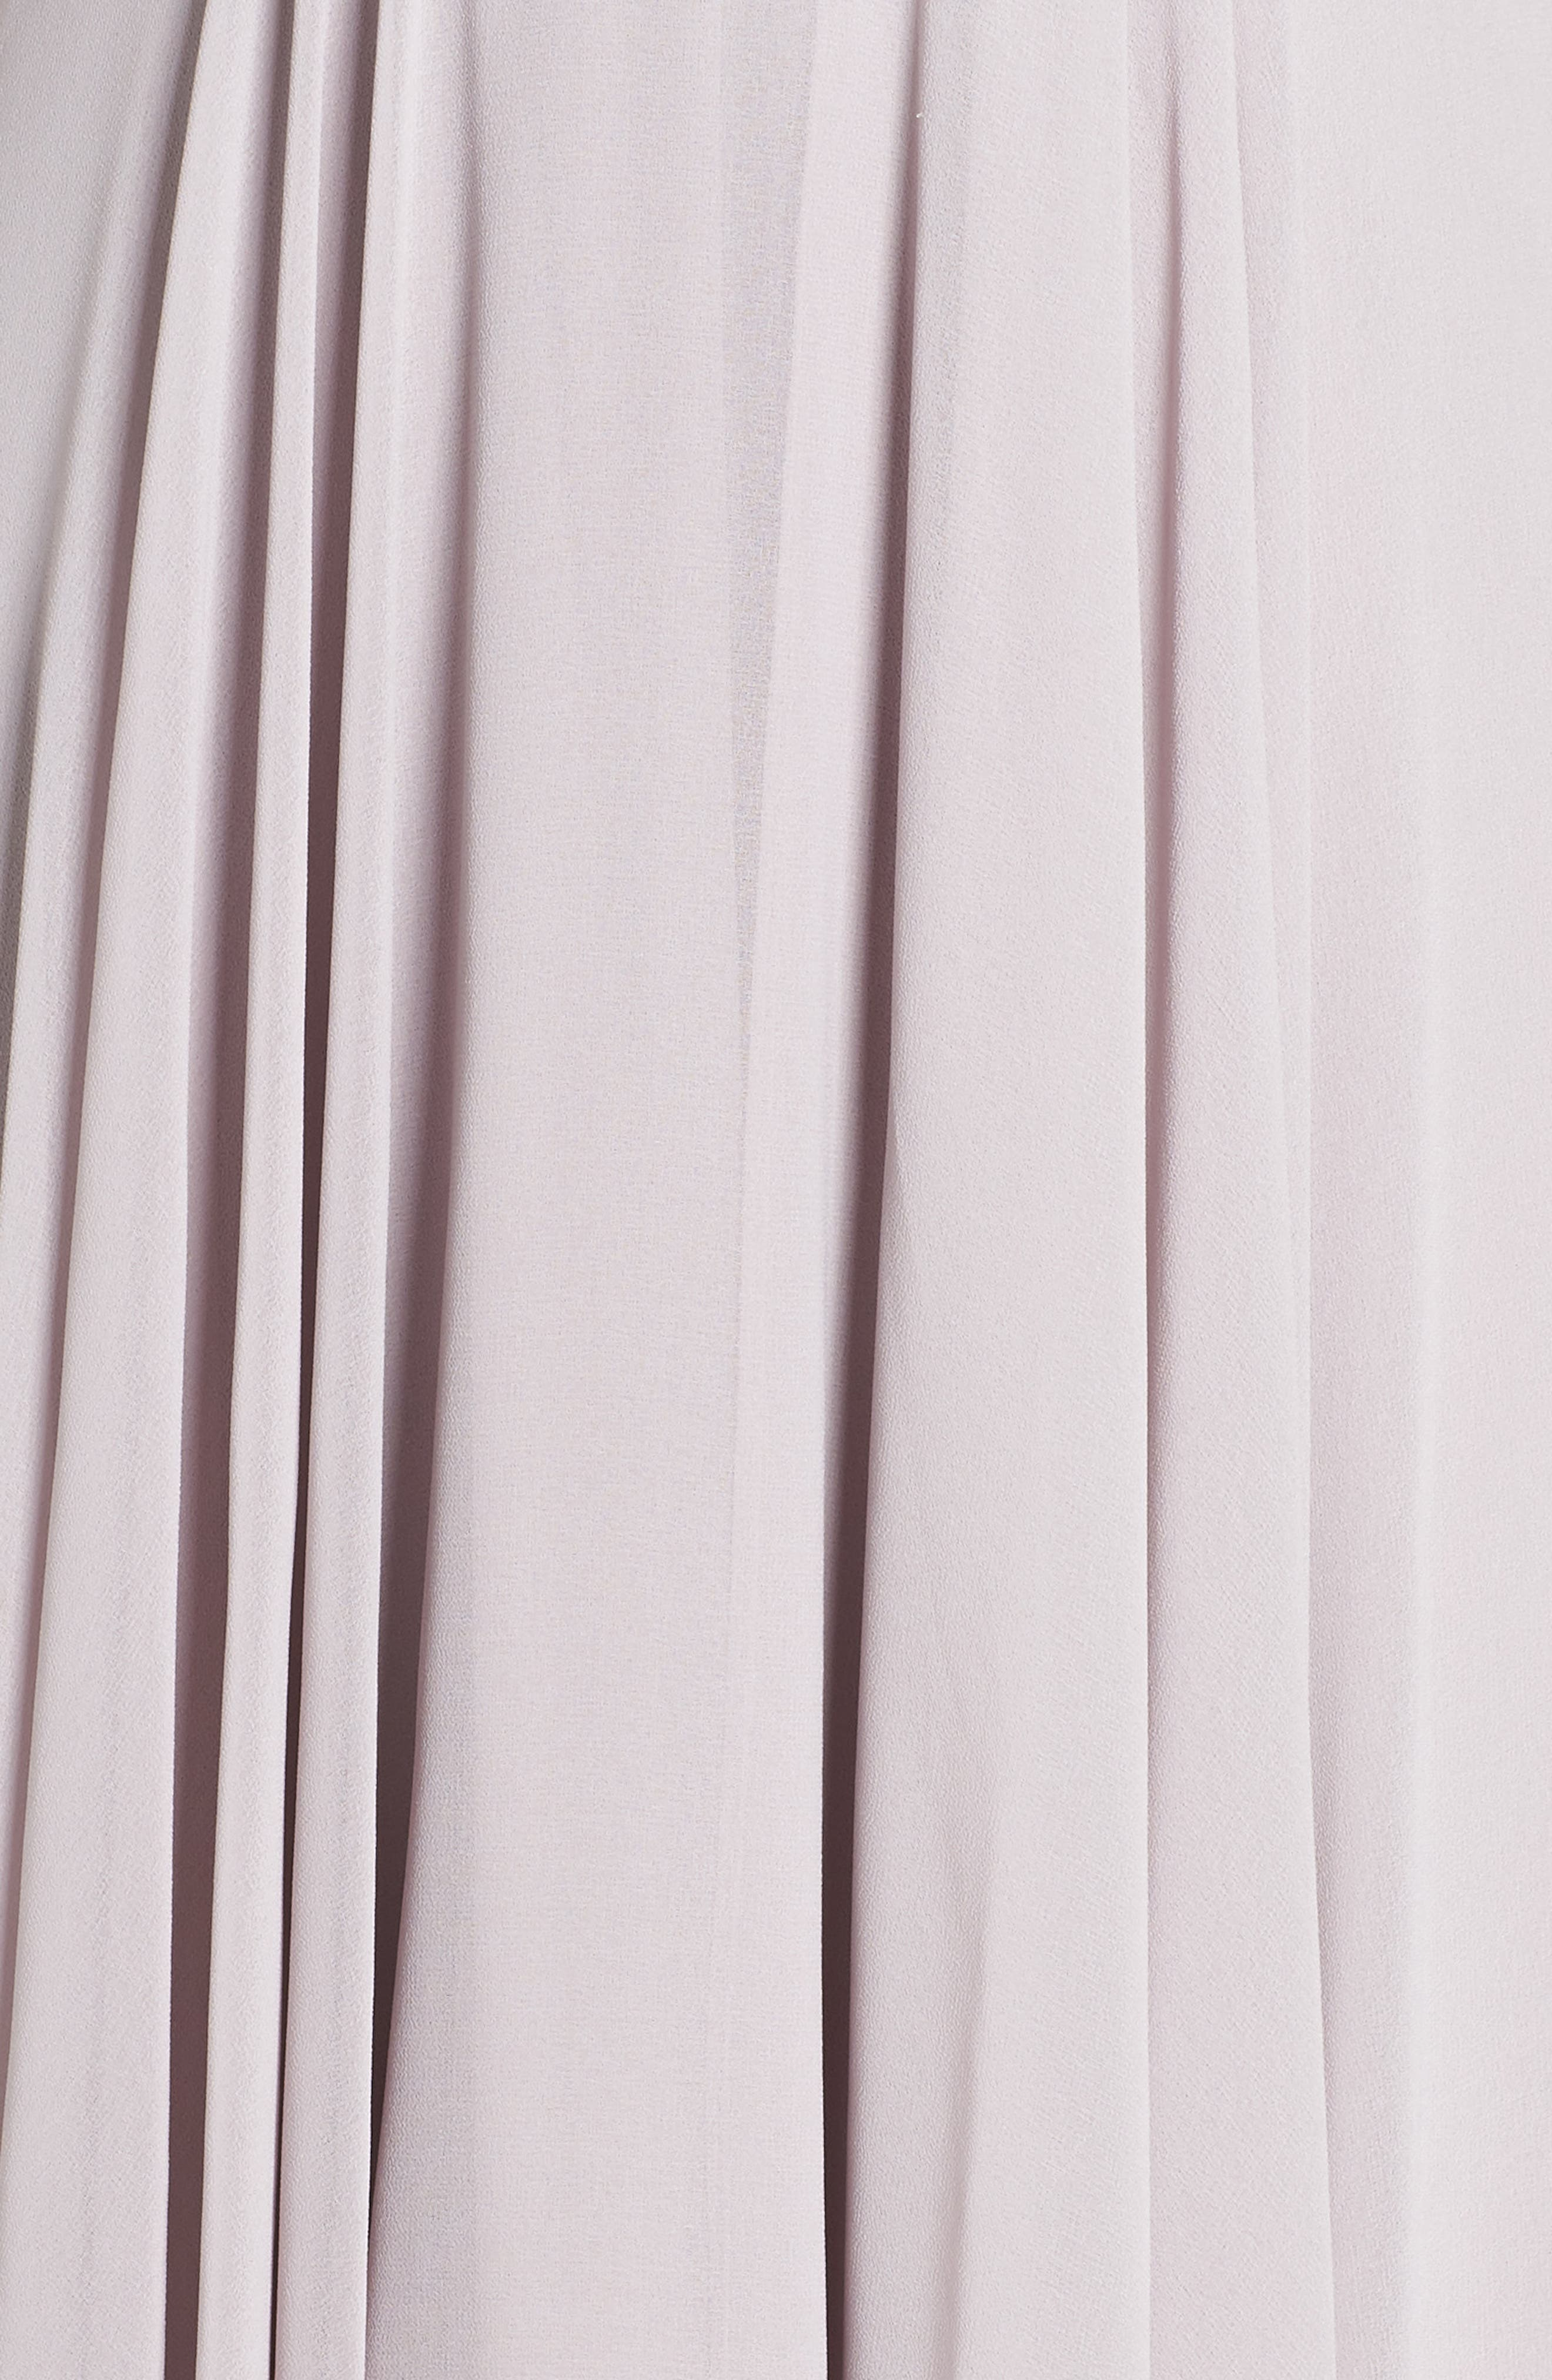 LULUS,                             Surplice Chiffon Gown,                             Alternate thumbnail 6, color,                             LIGHT GREY